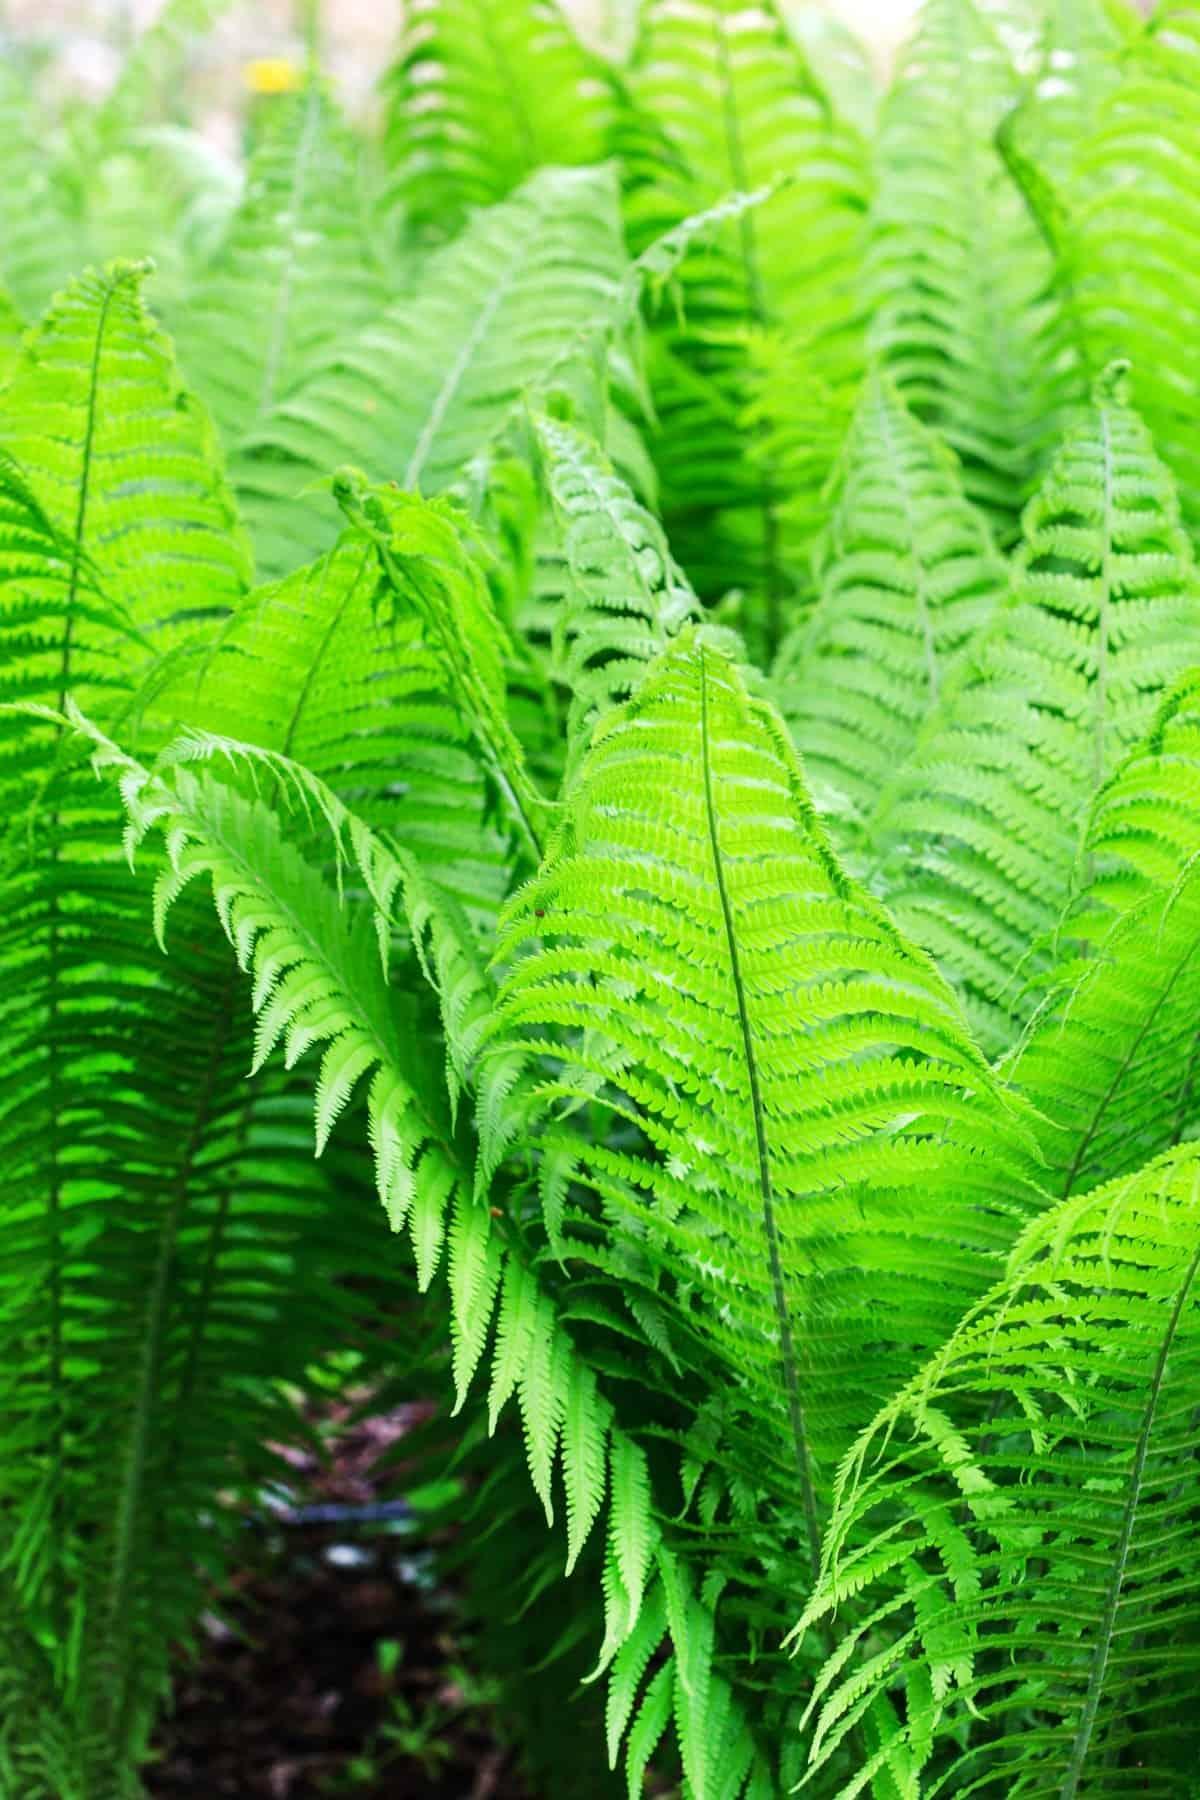 Ferns growing